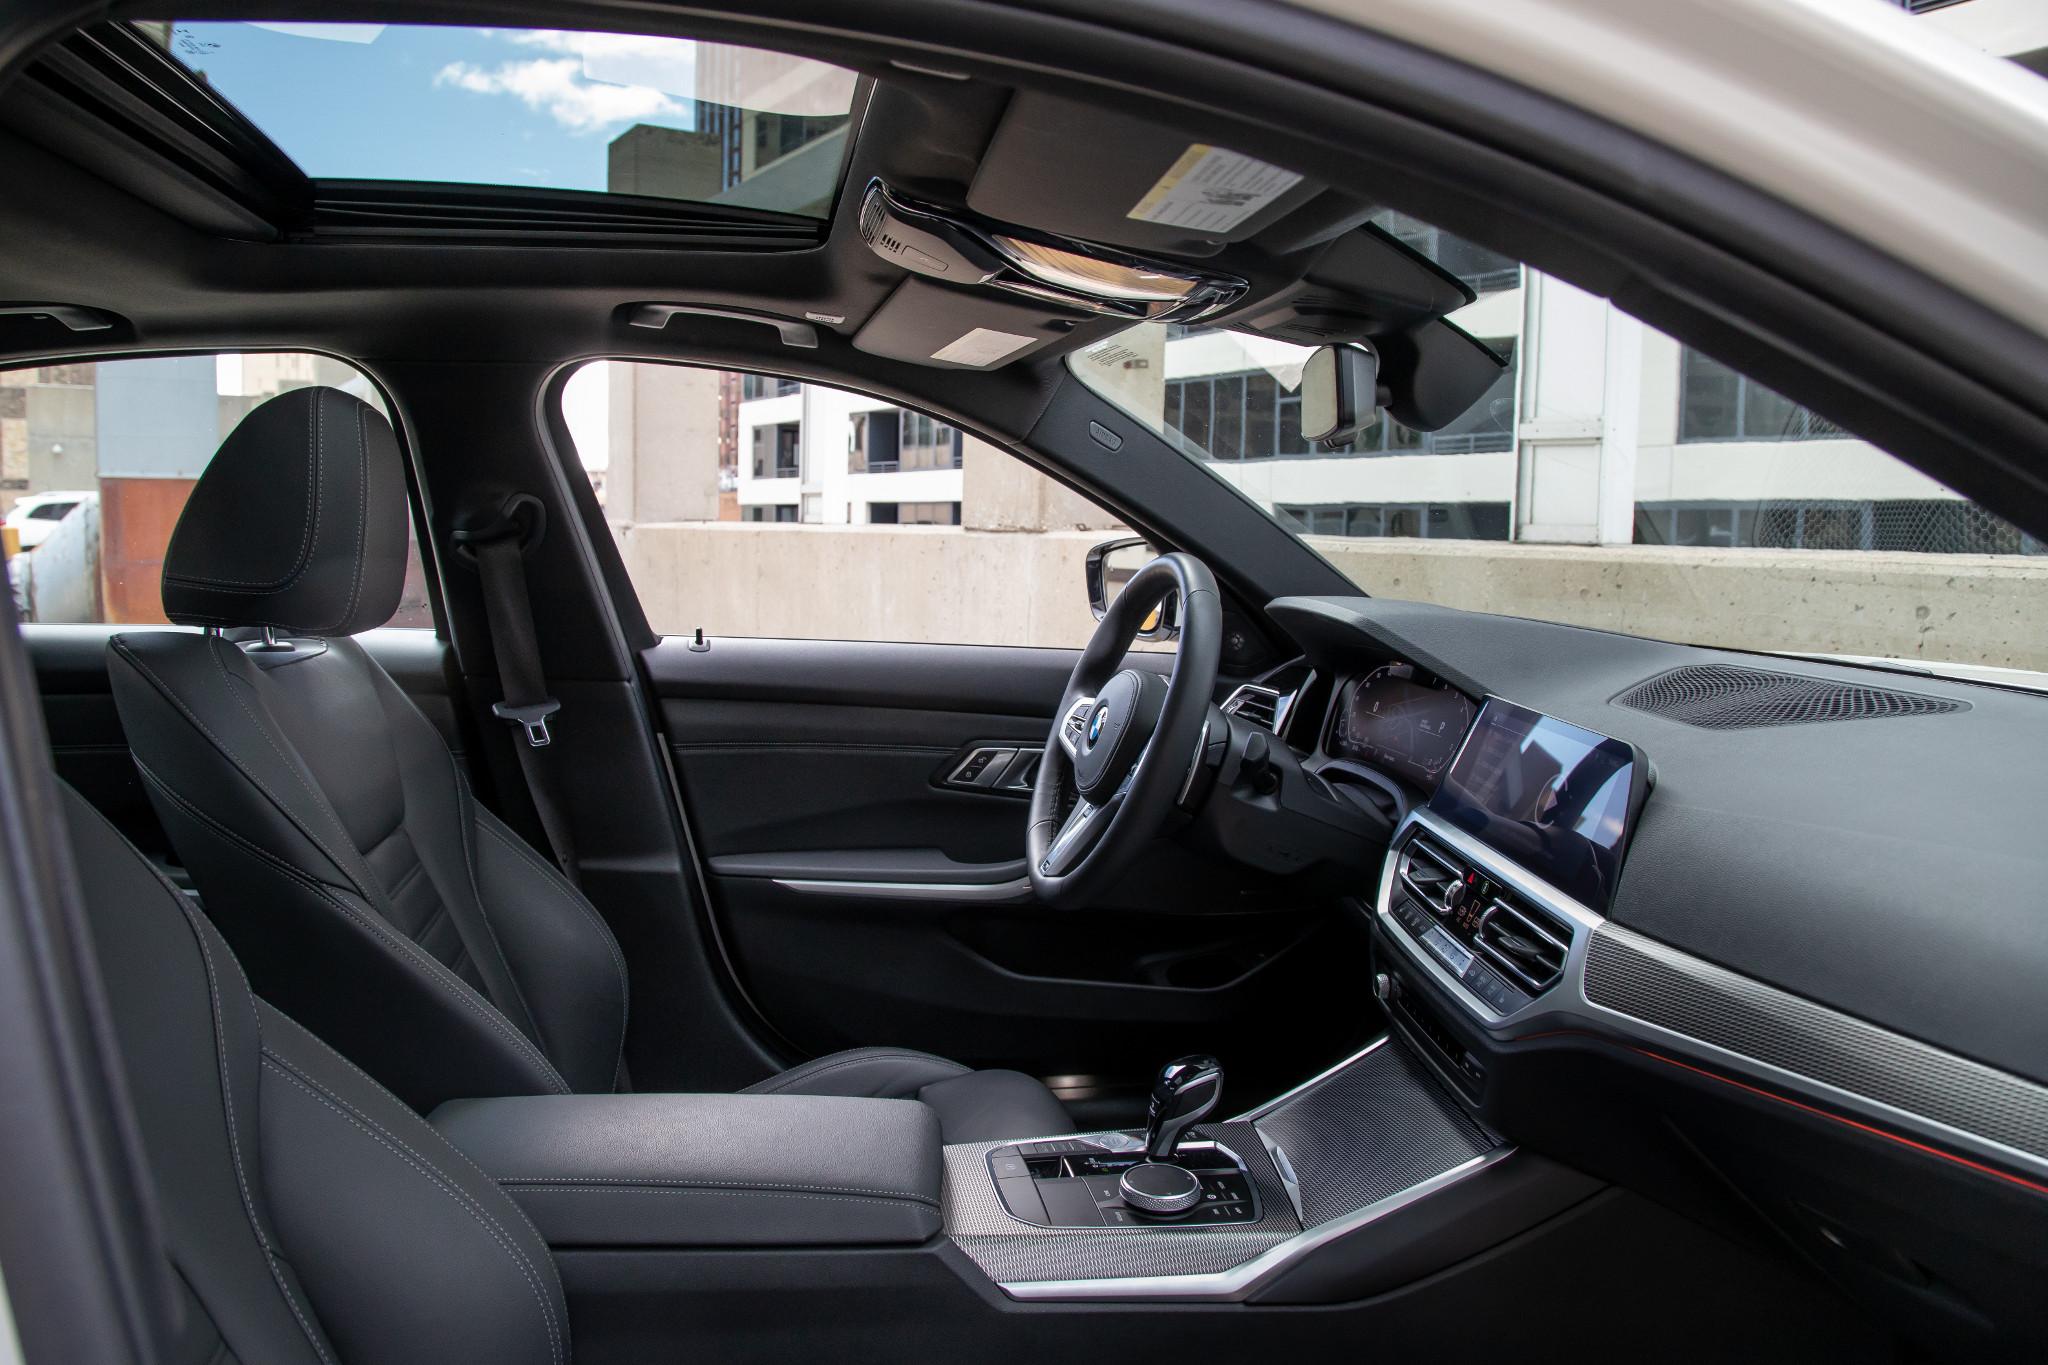 bmw-330i-2019-27-front-row--interior.jpg